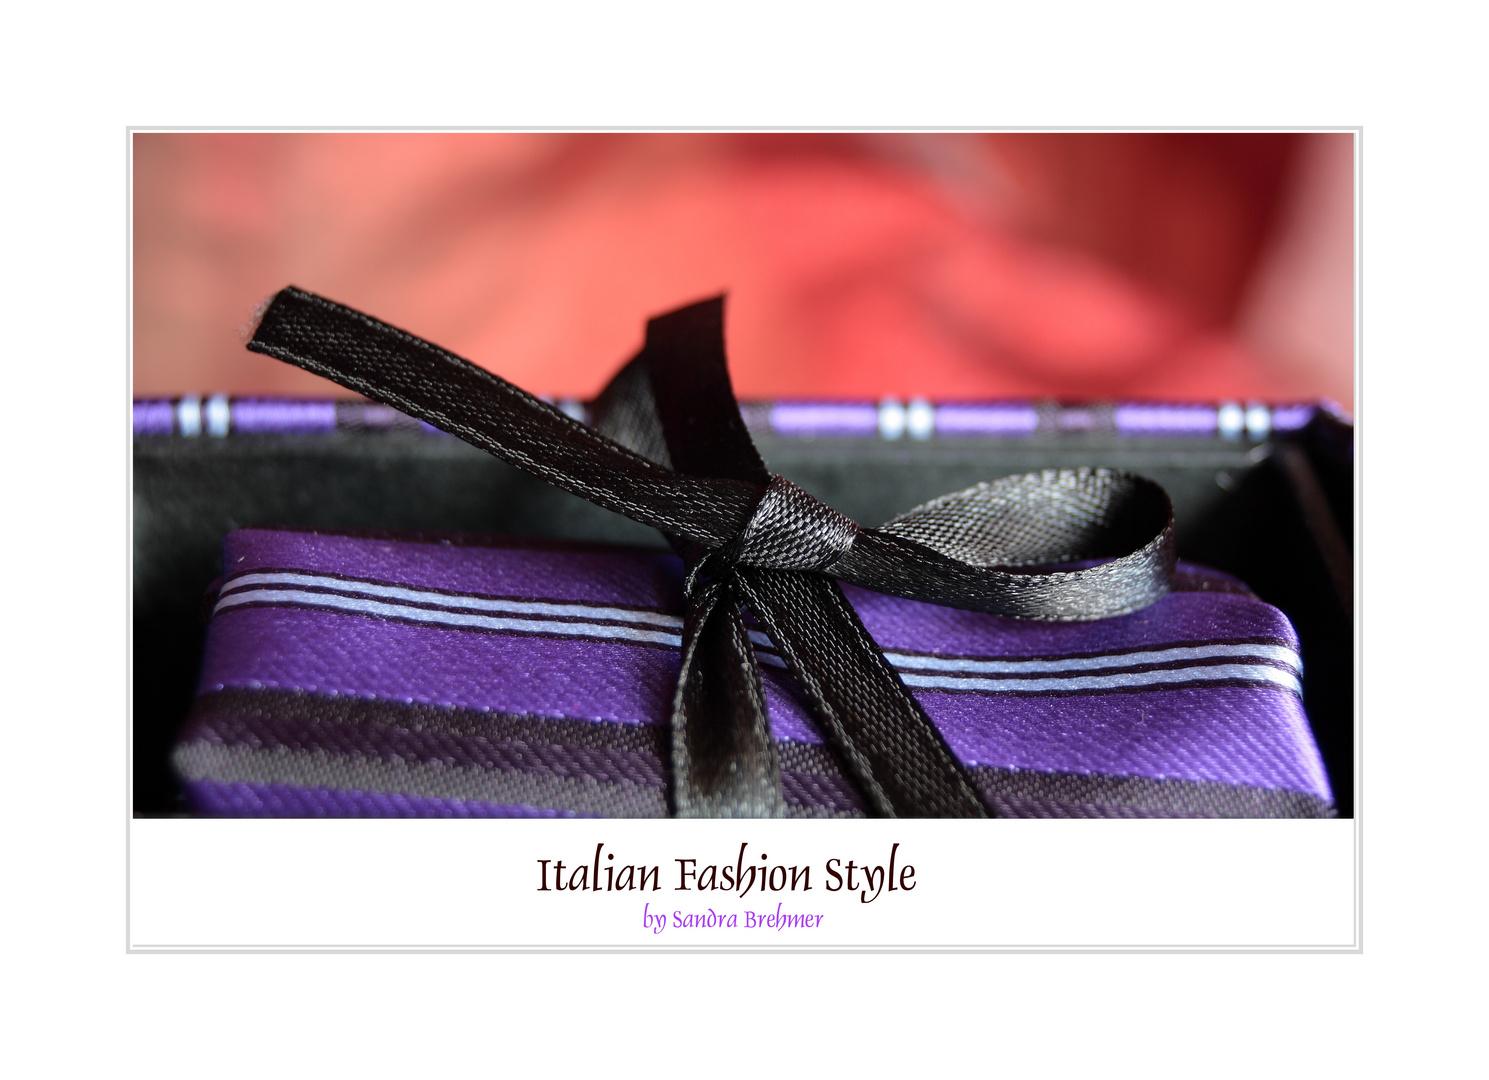 Italian Fashion Style